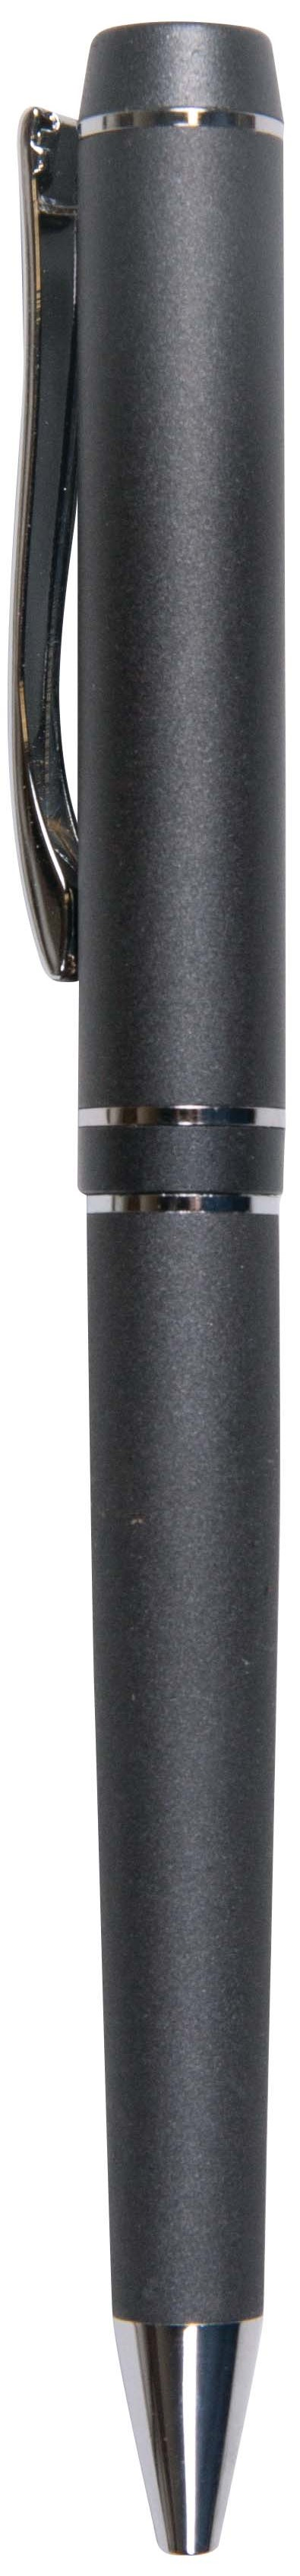 Metal Pen 8